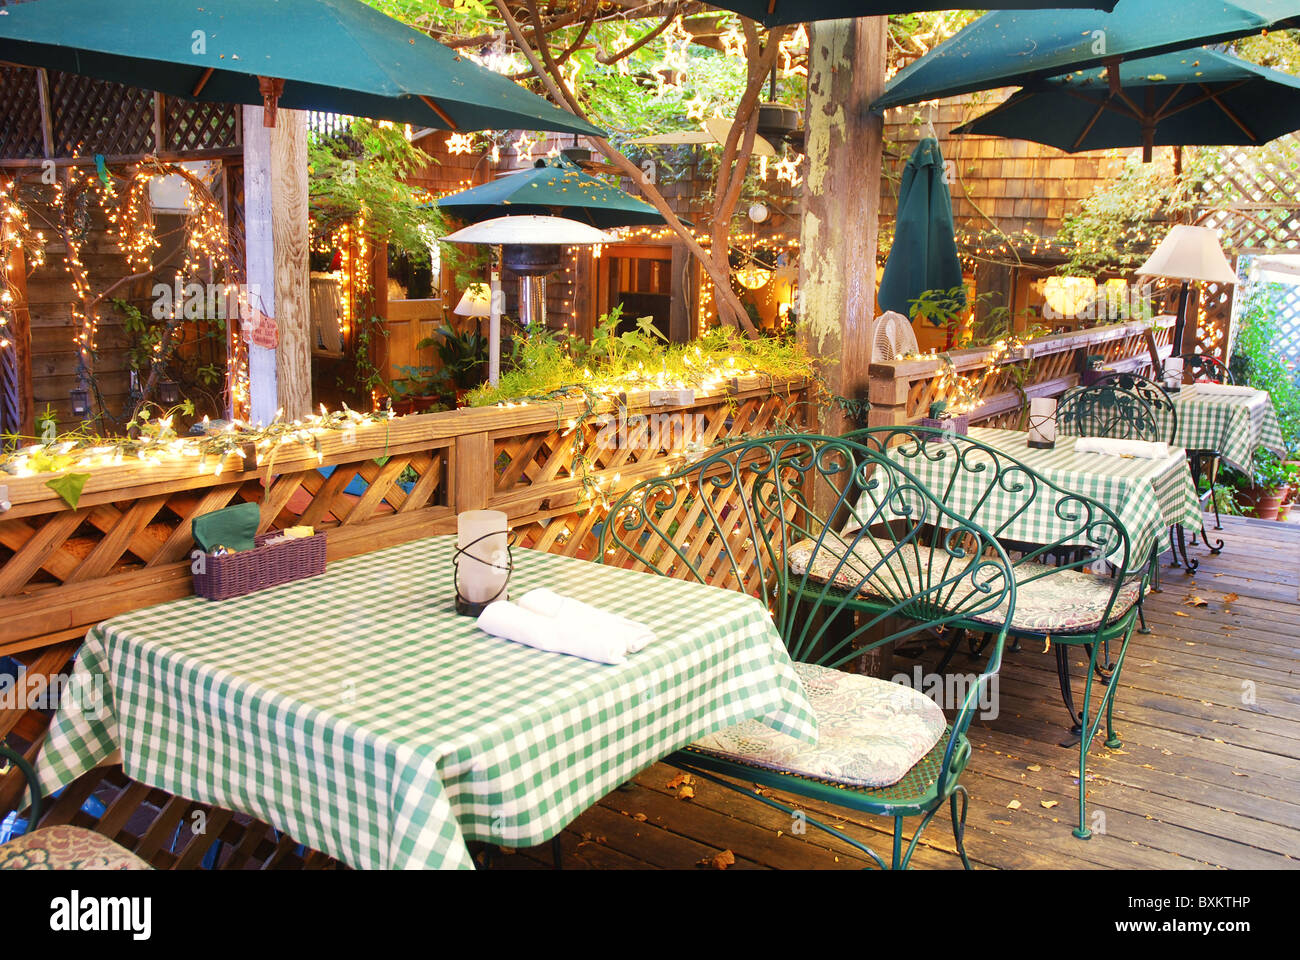 Interior of an outdoor restaurant Stock Photo